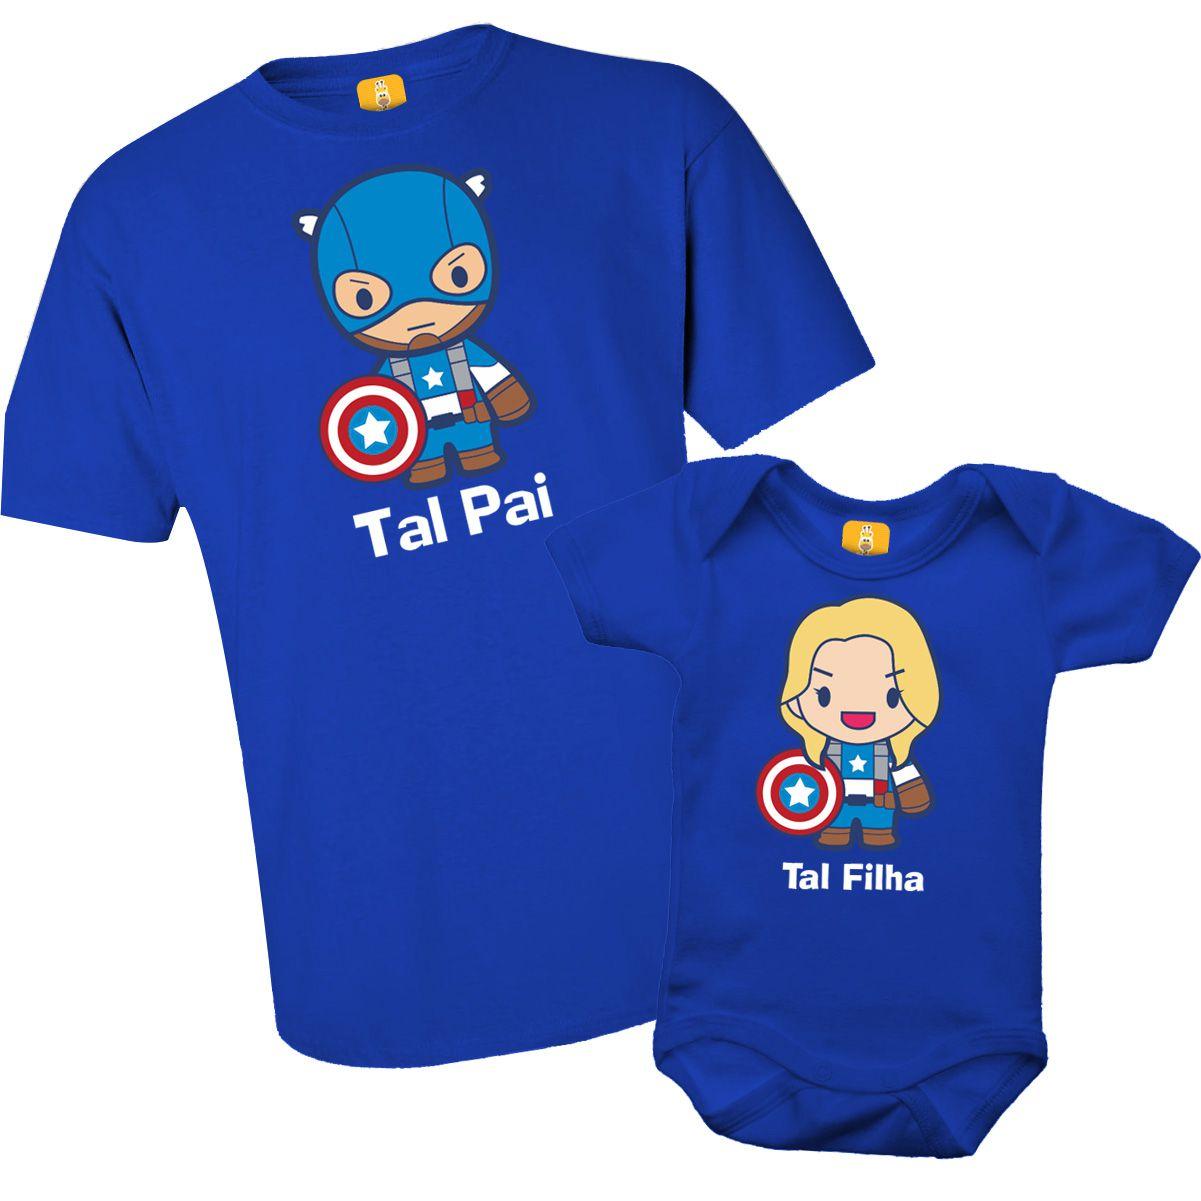 Kit camiseta - Tal pai, Tal filha Capitão America